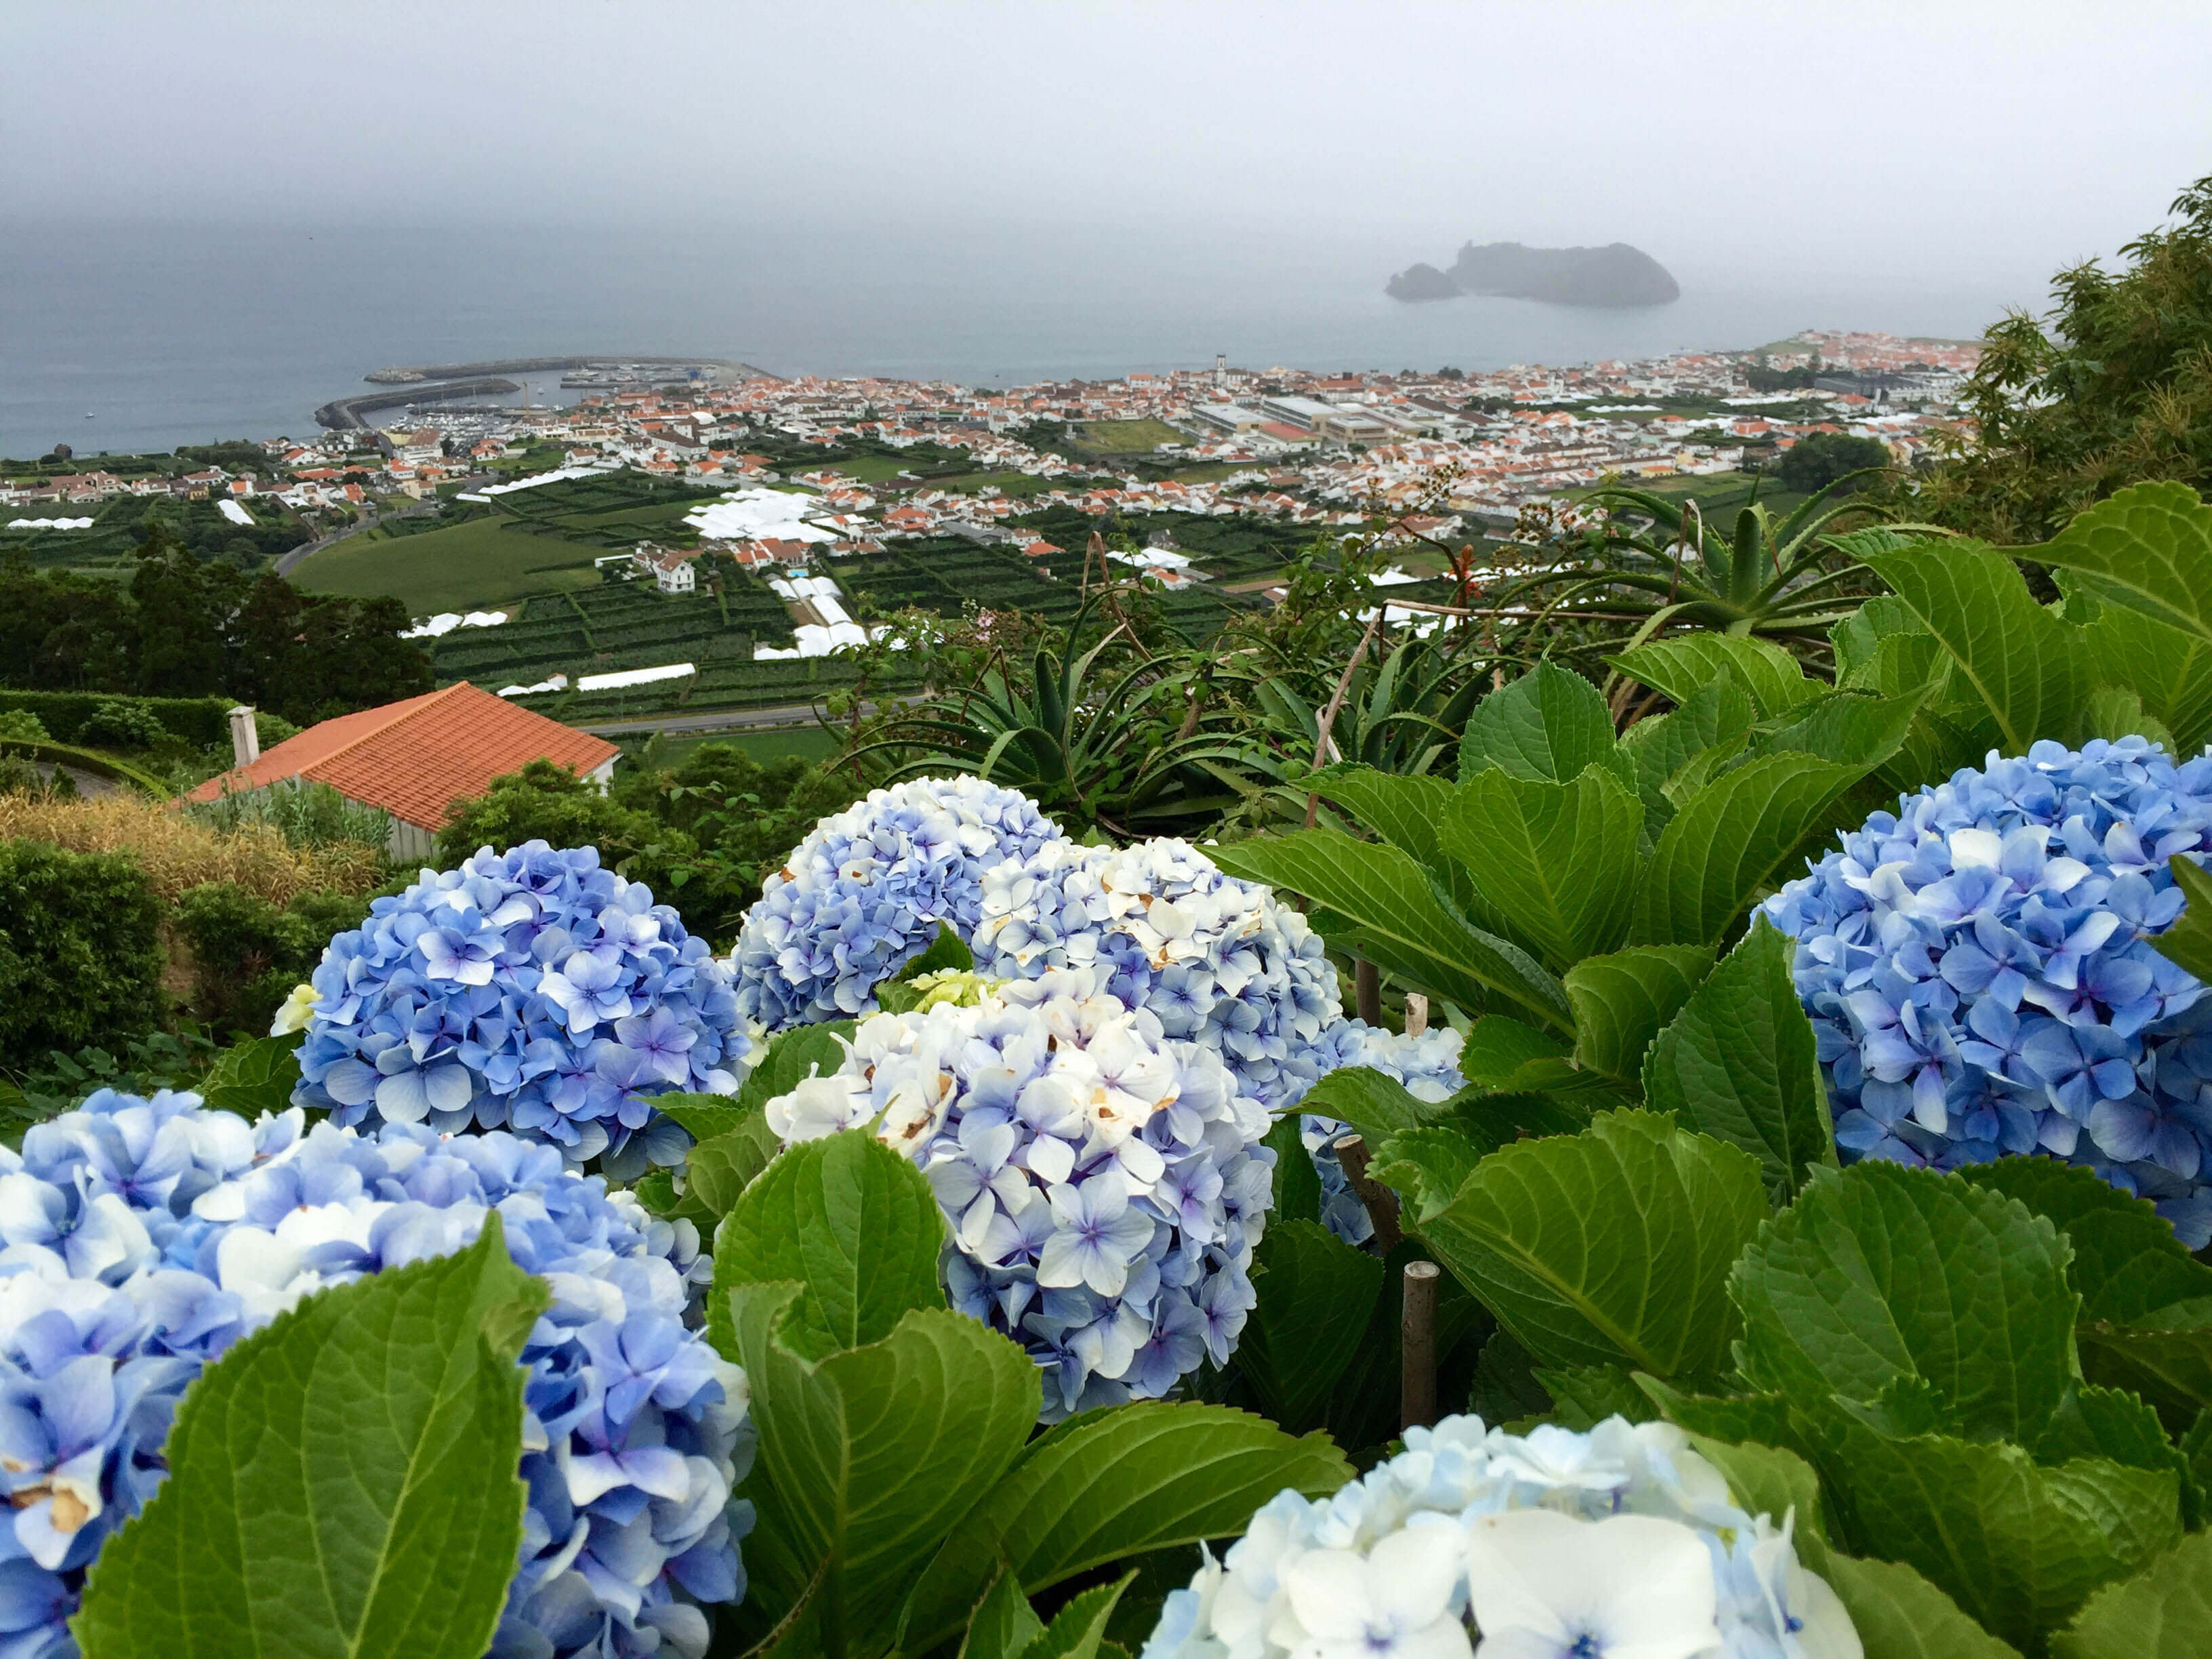 São Miguel Island, miradouro Campo Franco